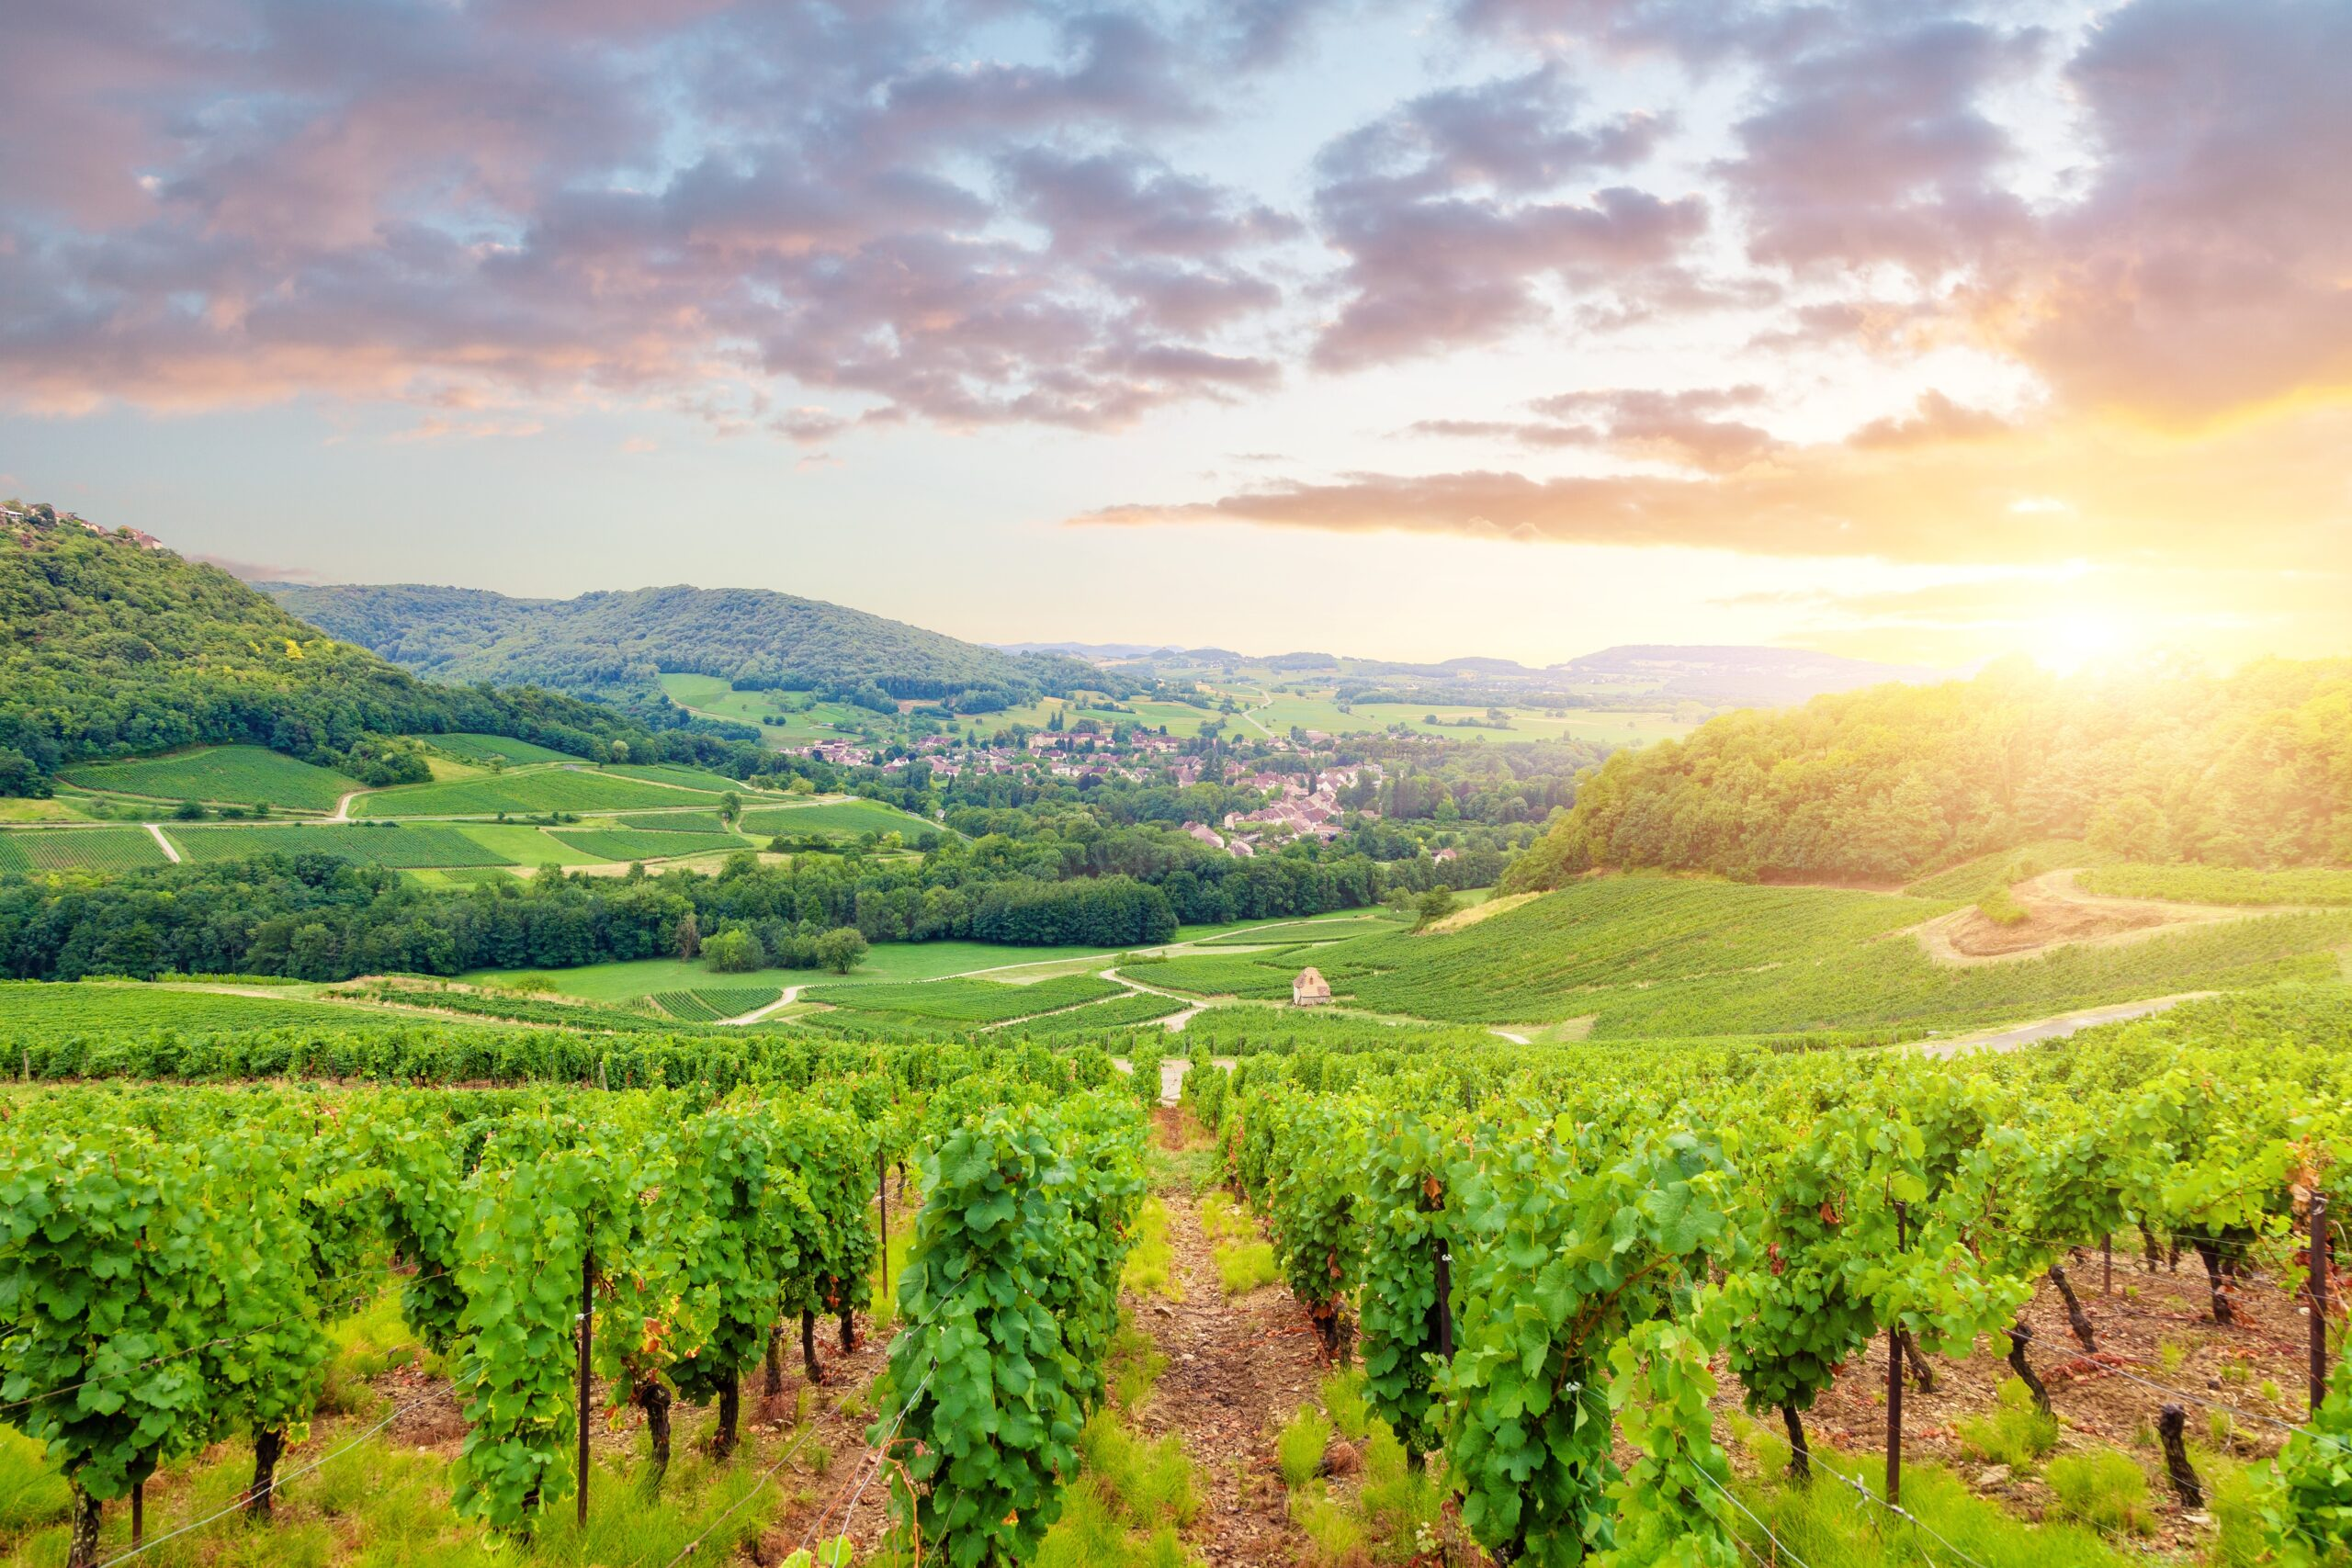 Viner fra Burgund versus California